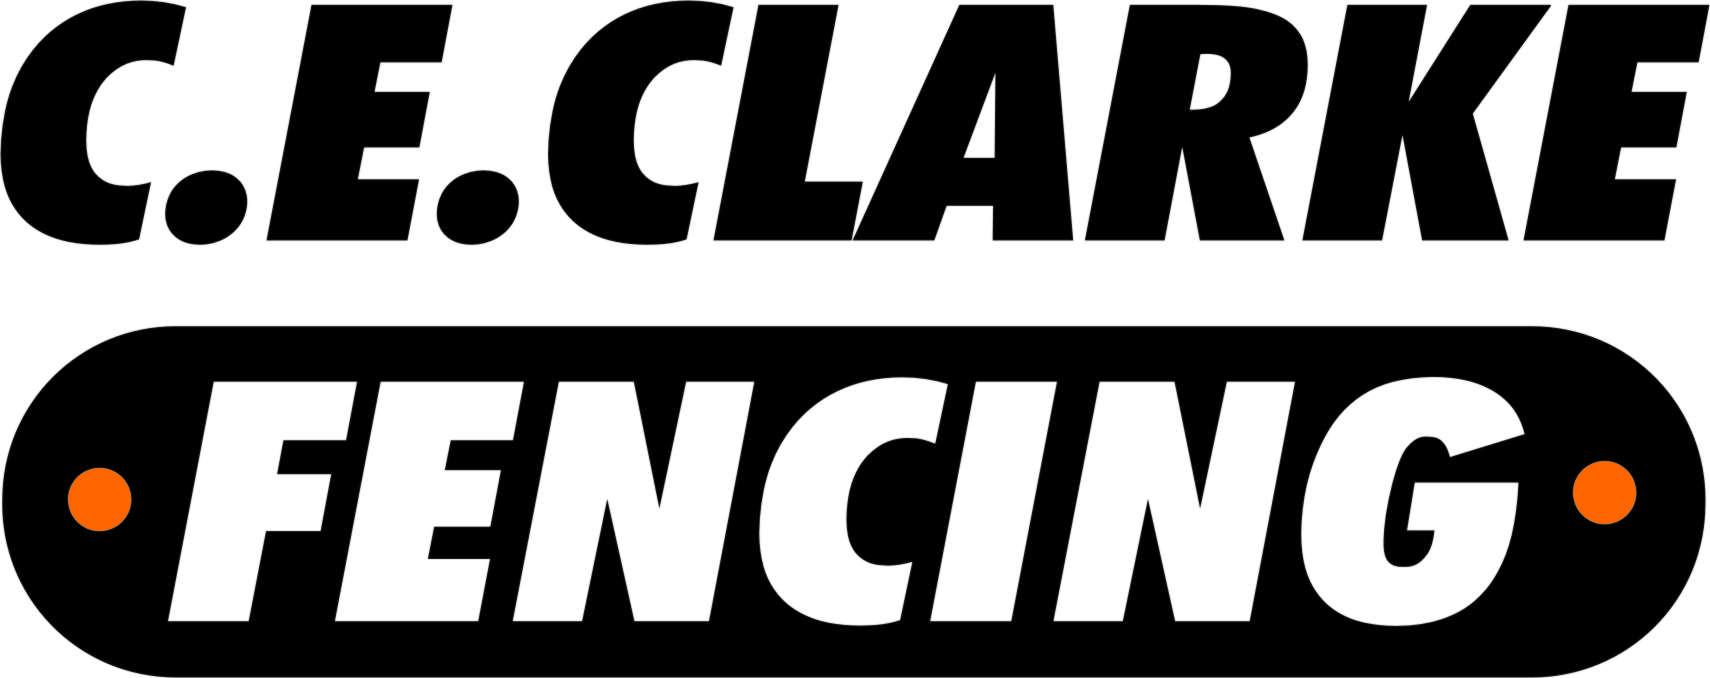 C. E. Clarke Fencing